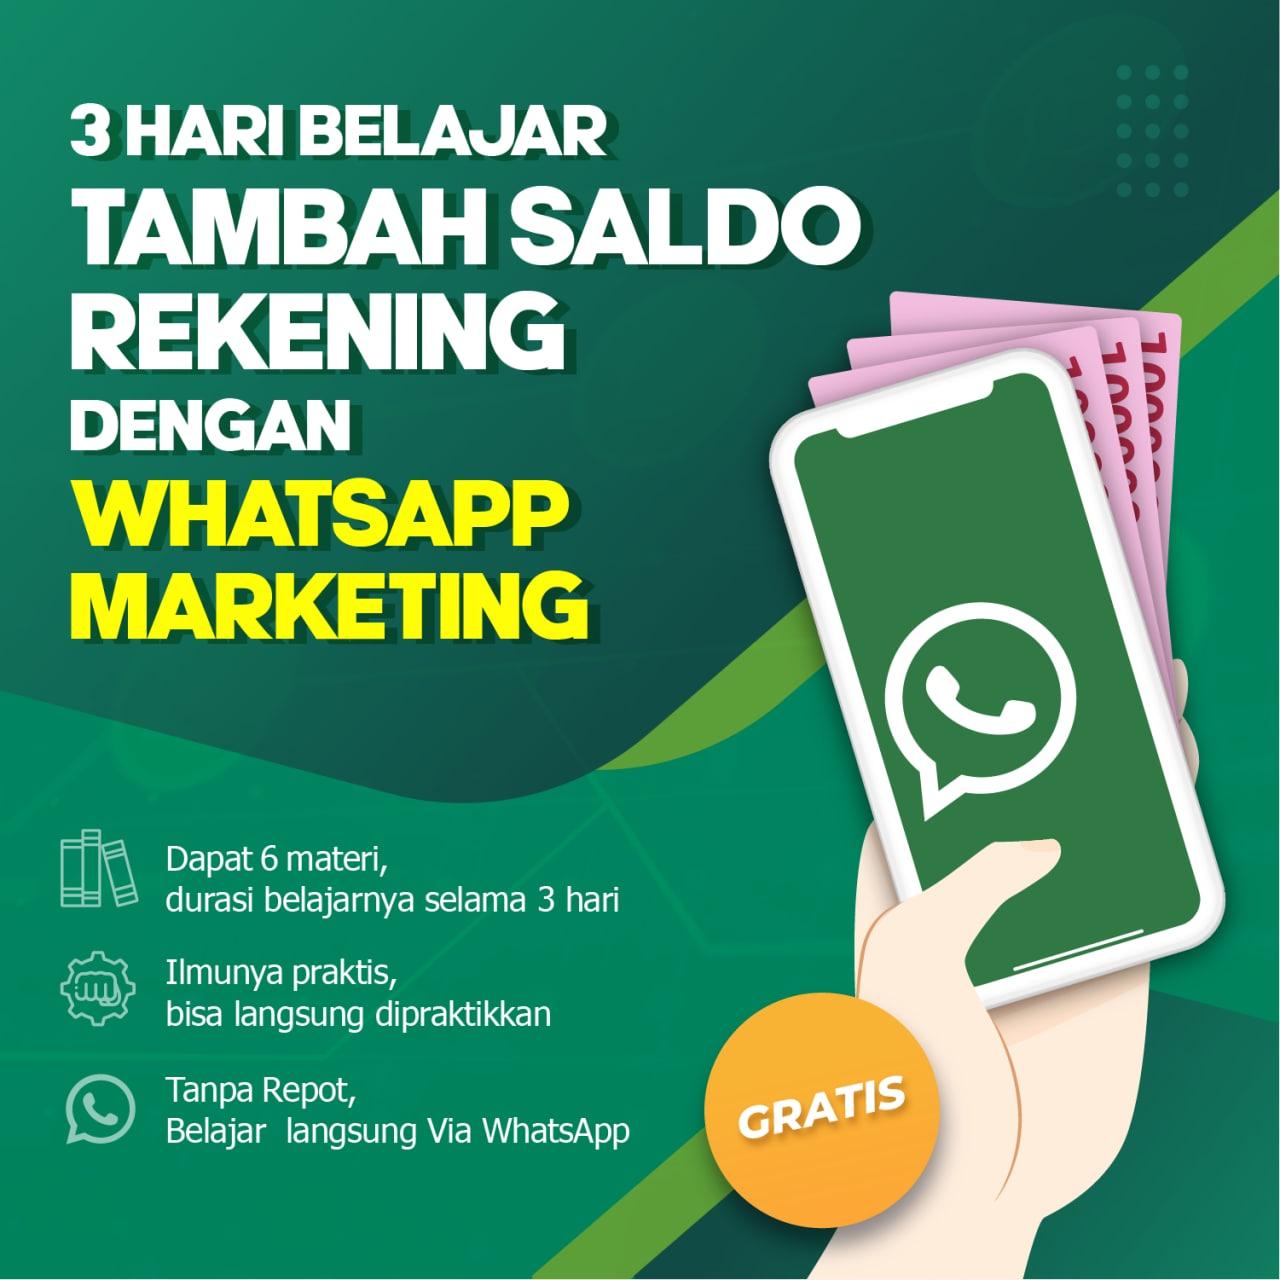 Belajar Tambah Saldo Rekening Dengan Whatsapp Marketing